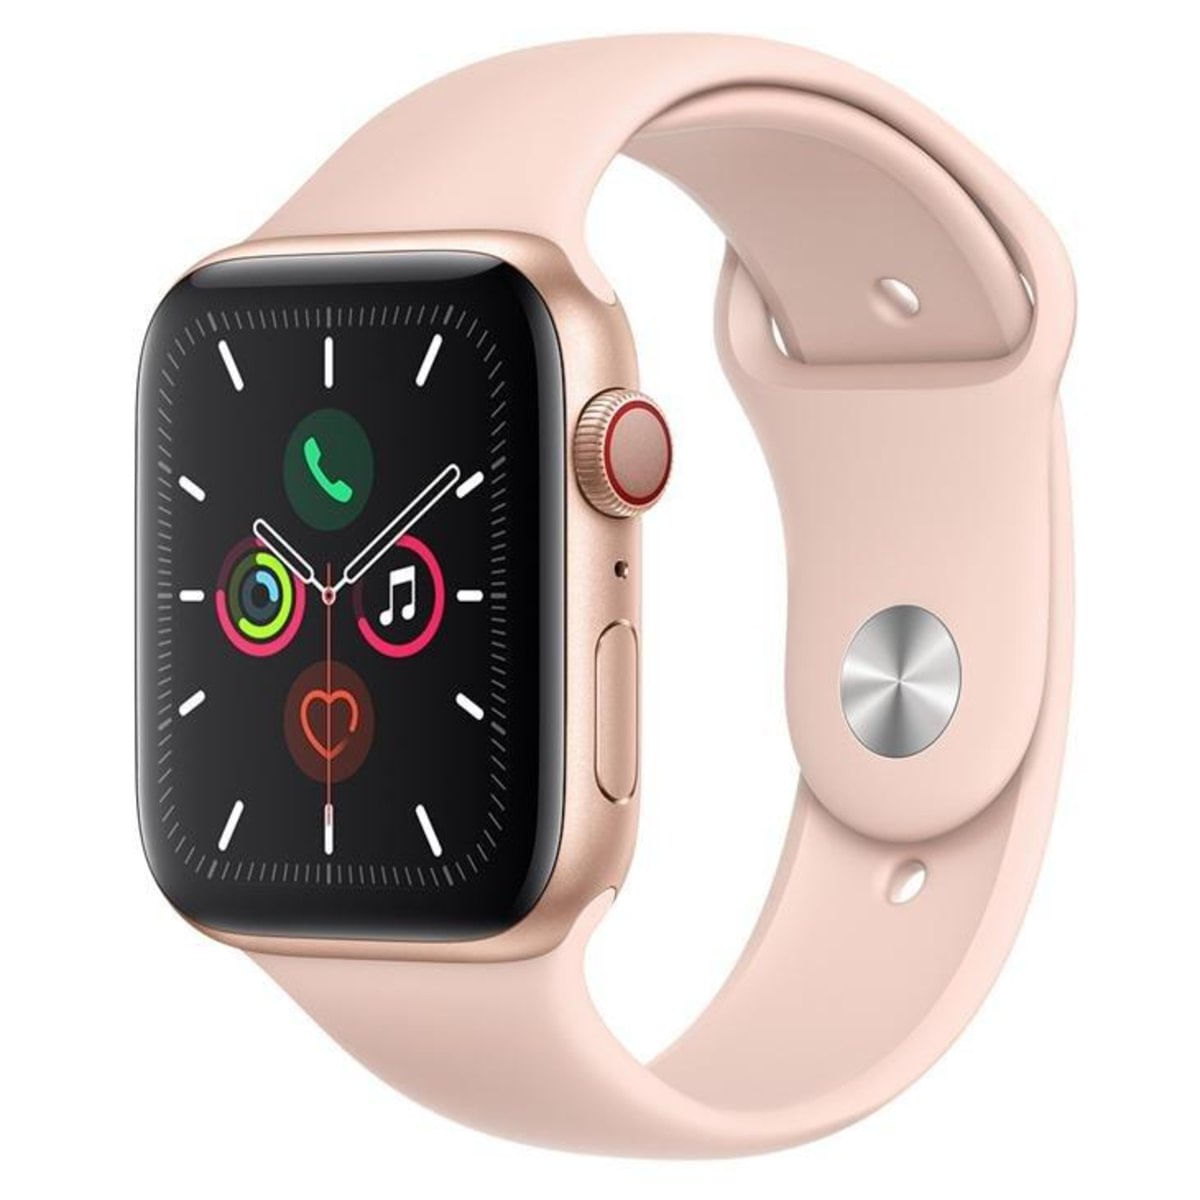 Imagem de Apple Watch Series 5 Cellular + GPS 44mm